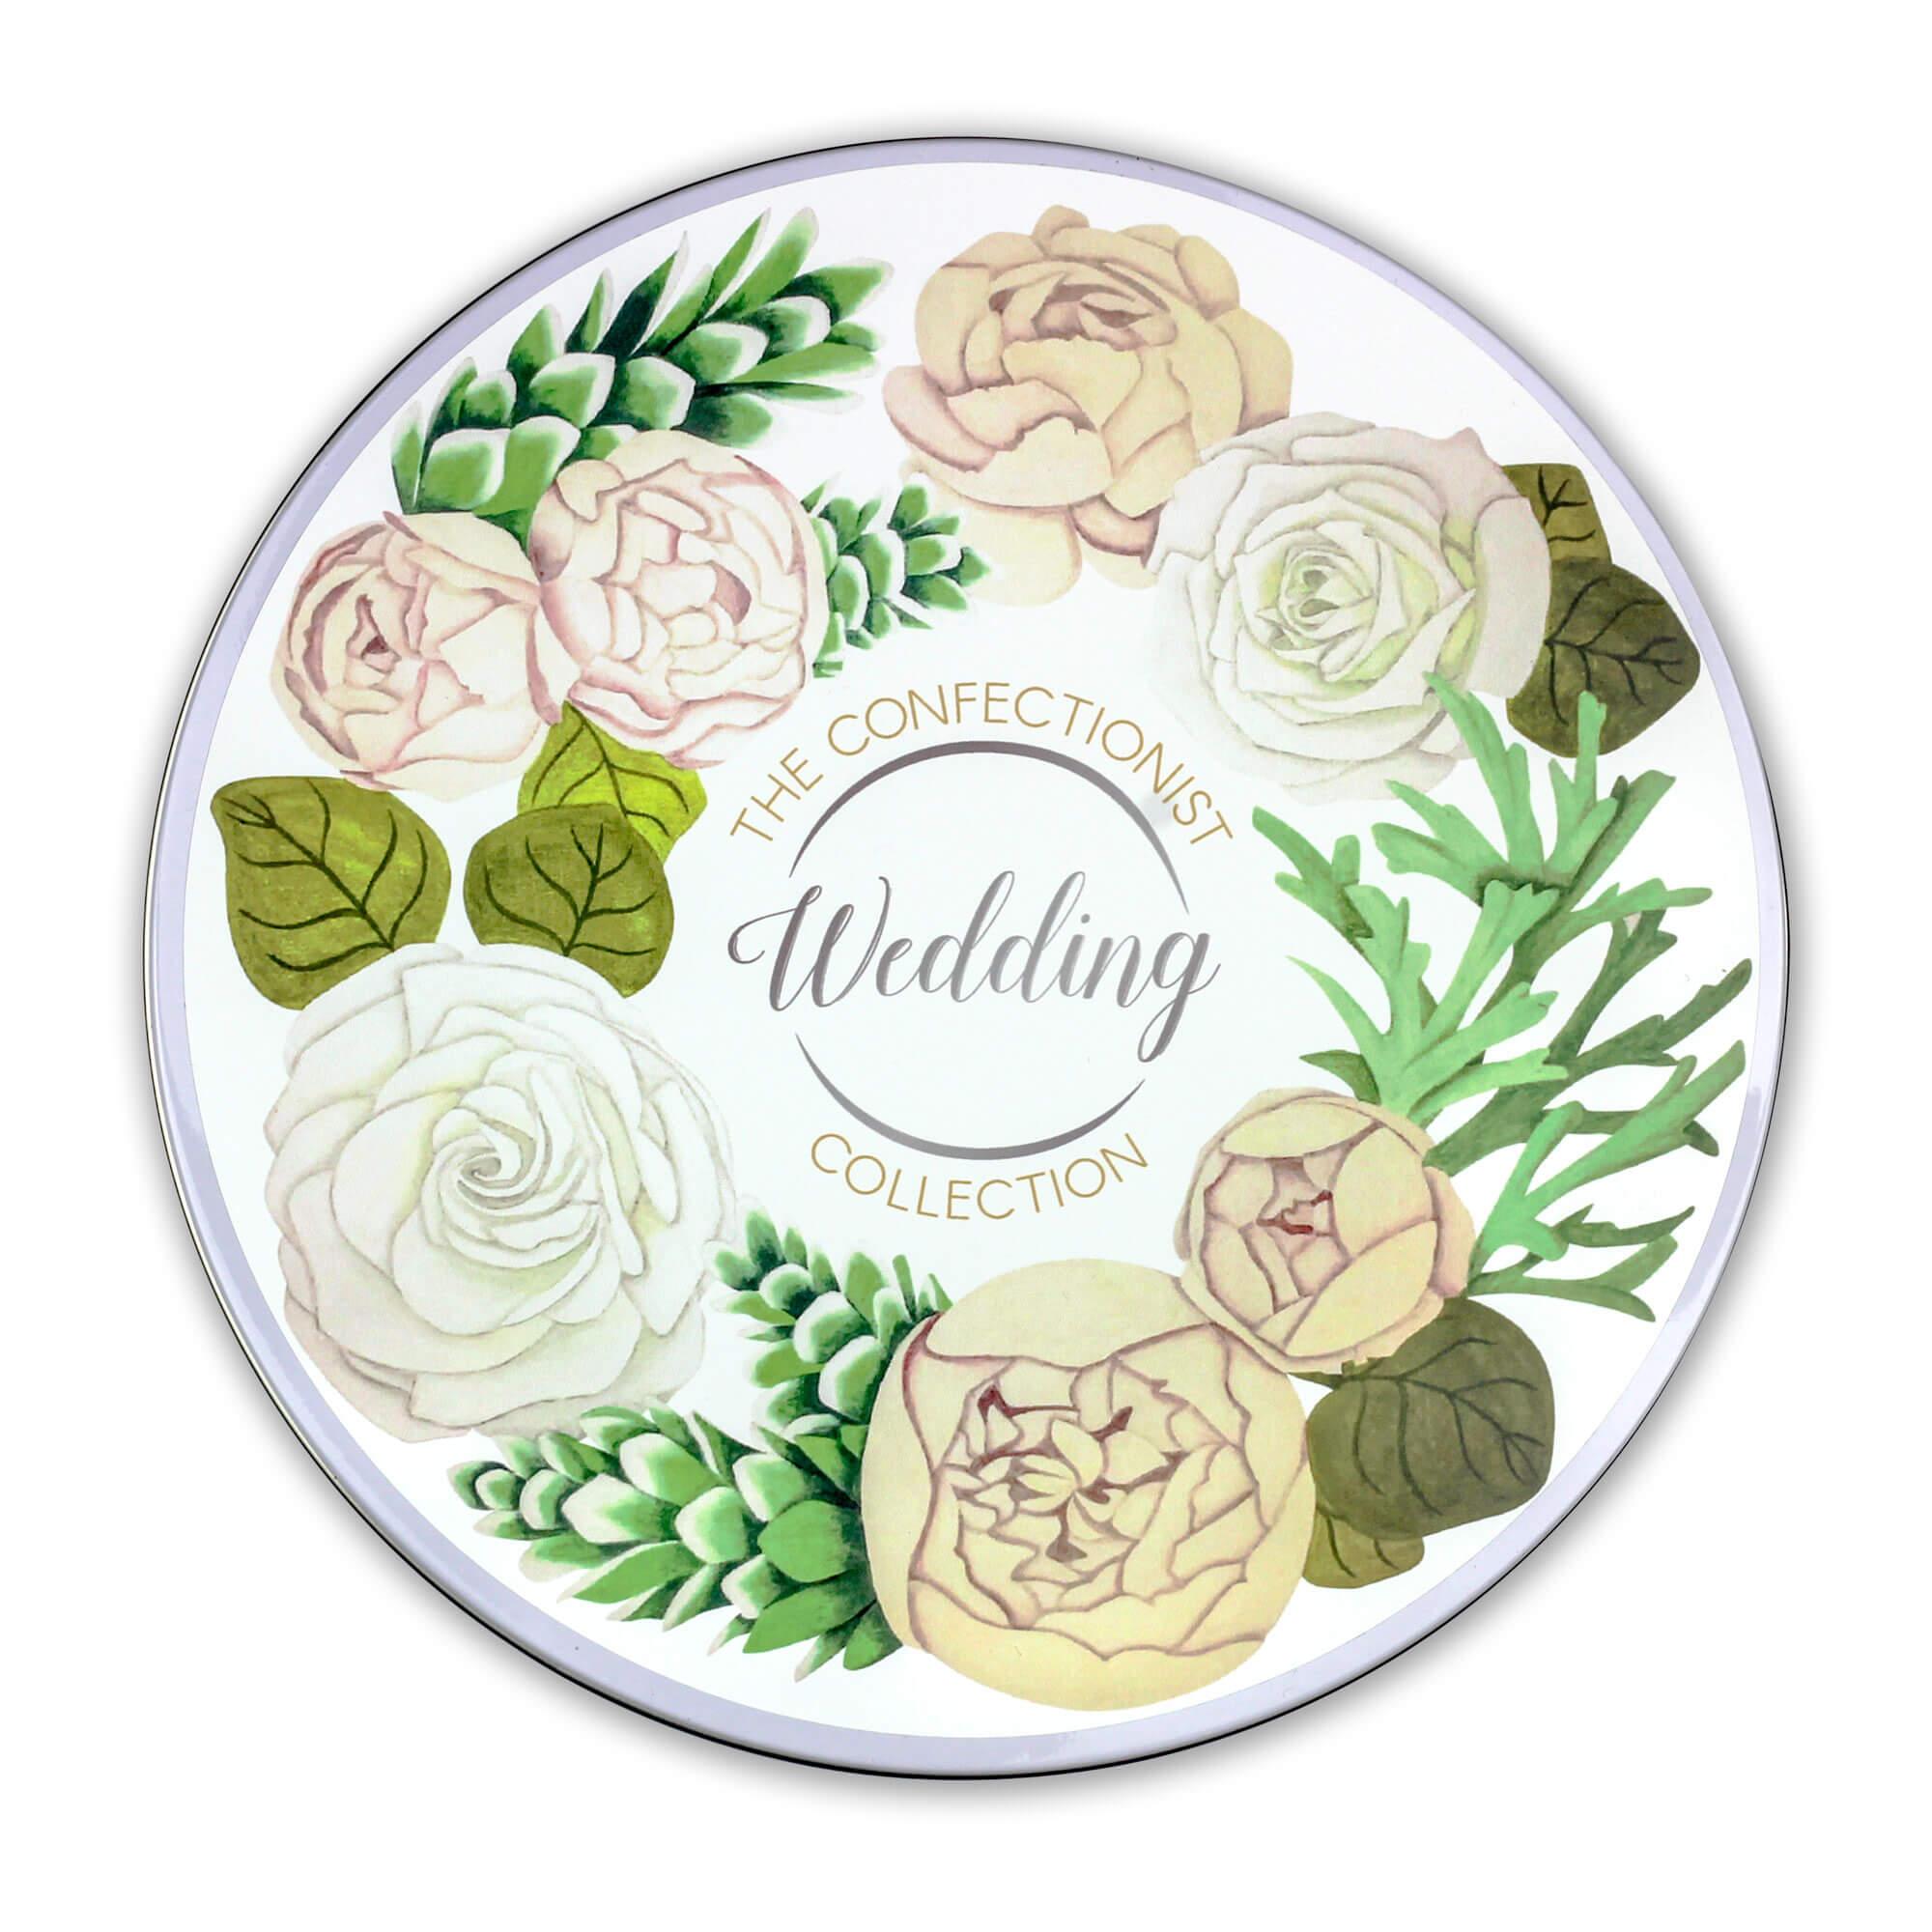 Wedding Collection Tin Lid